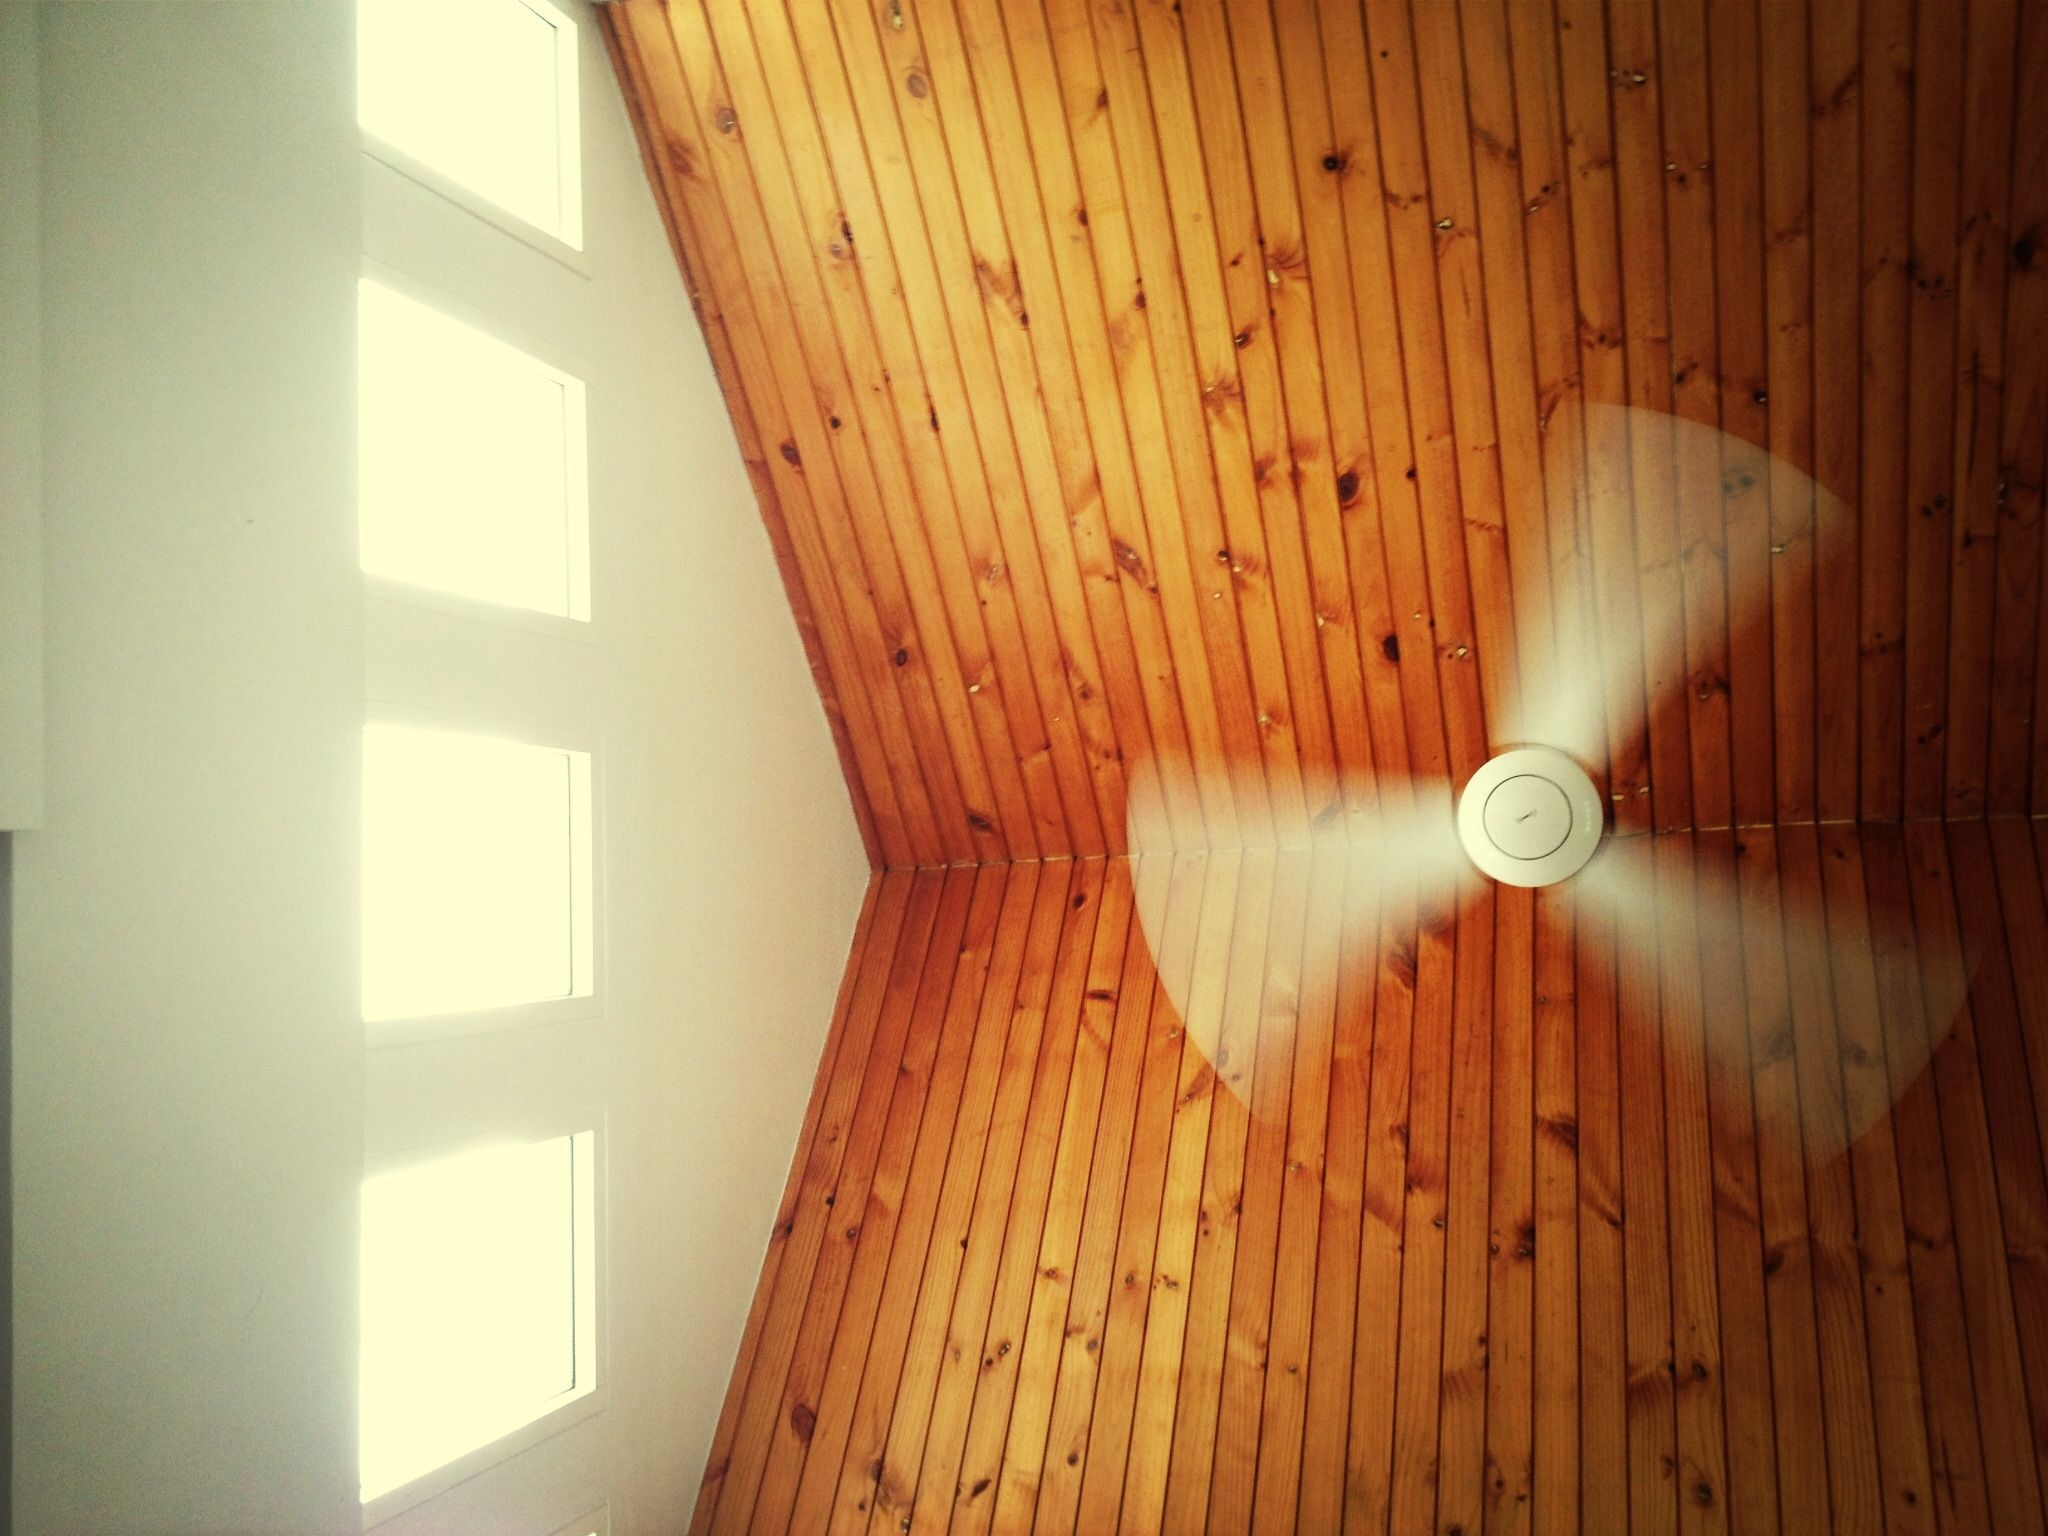 Tips For Eliminating Ceiling Fan Noise